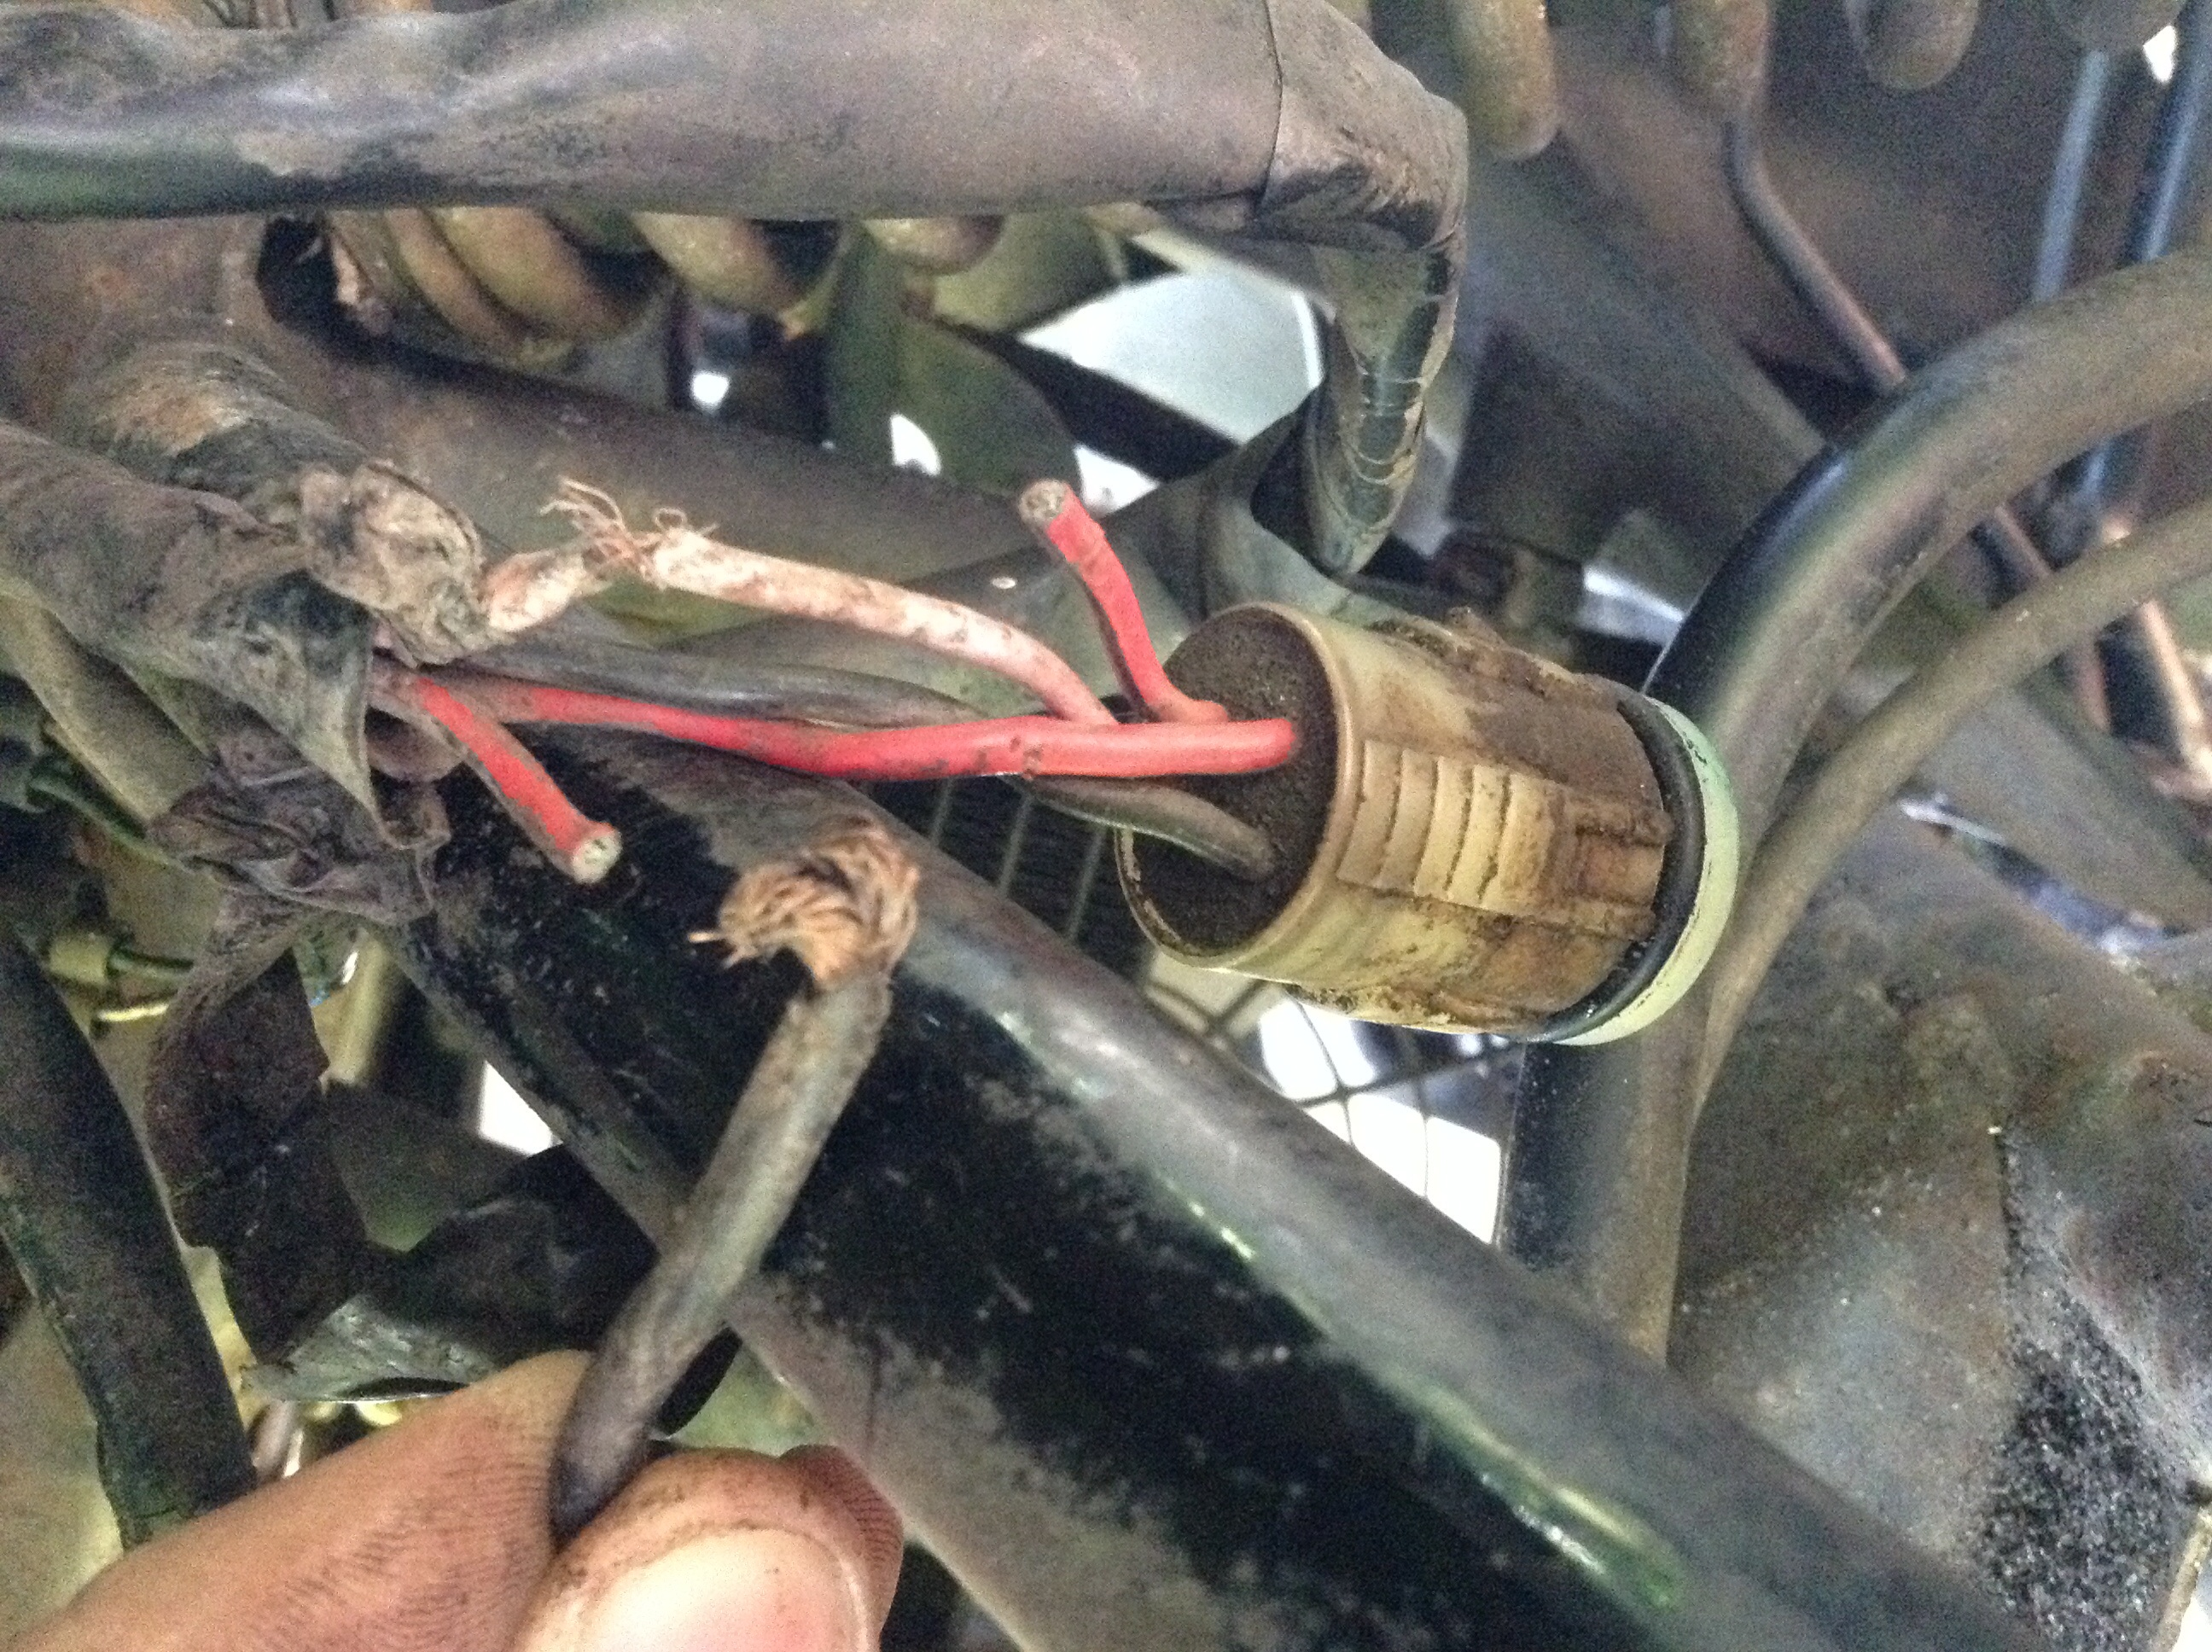 Honda Rancher Ignition Switch Wiring Manual Of Diagram 350 01 Es Won T Start Page 3 Atv Forum Rh Hondaatvforums Net 250 2002